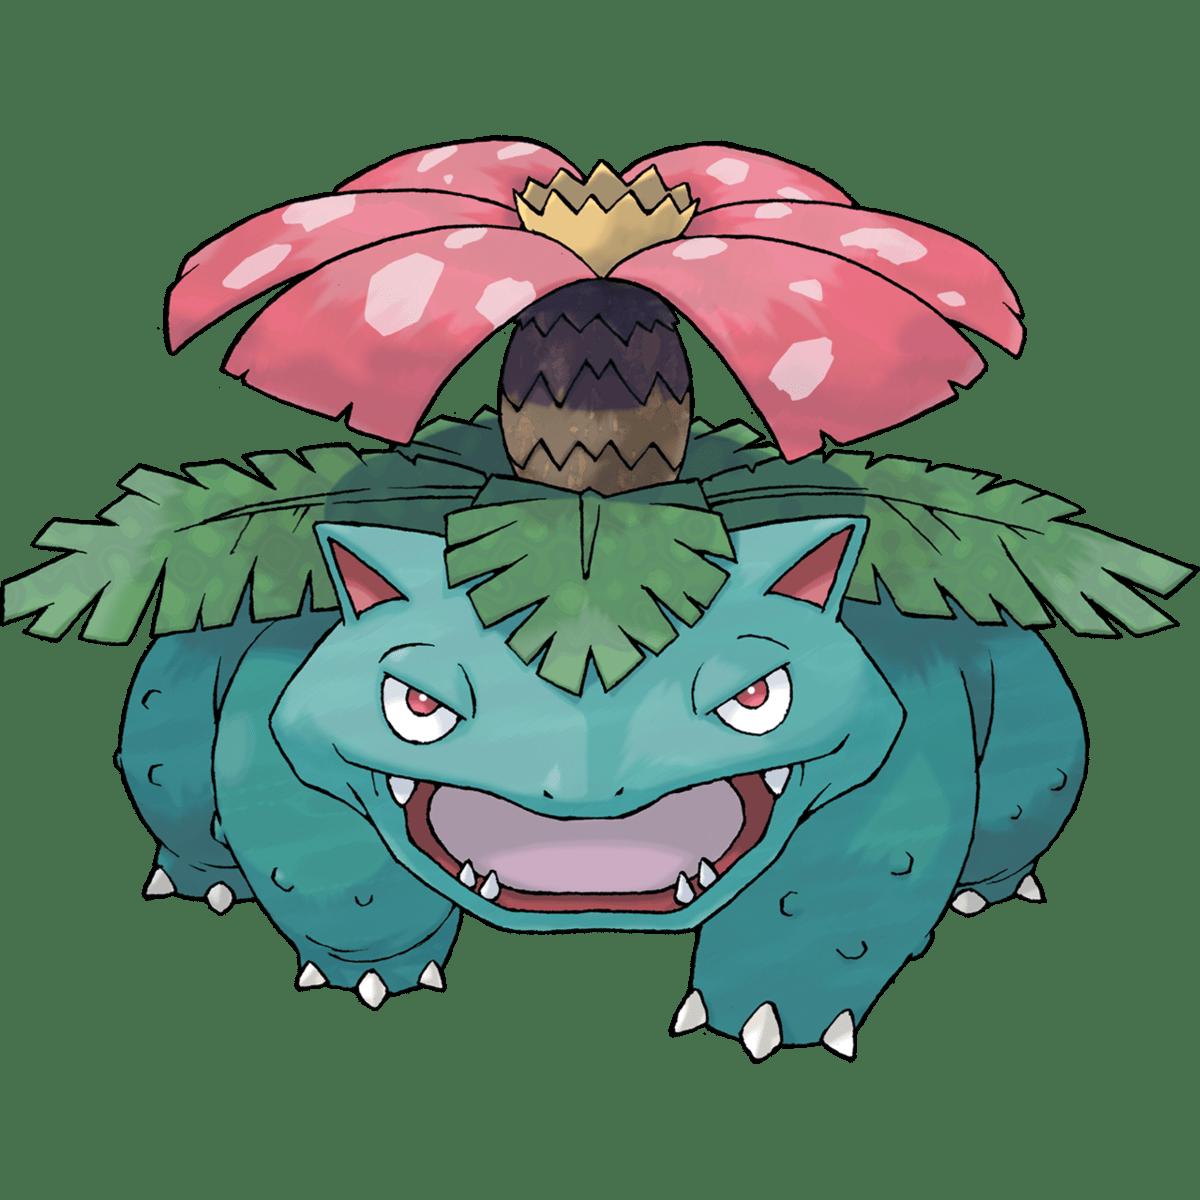 Venusaur, one of the best Grass type Pokemon in Pokemon Let's Go